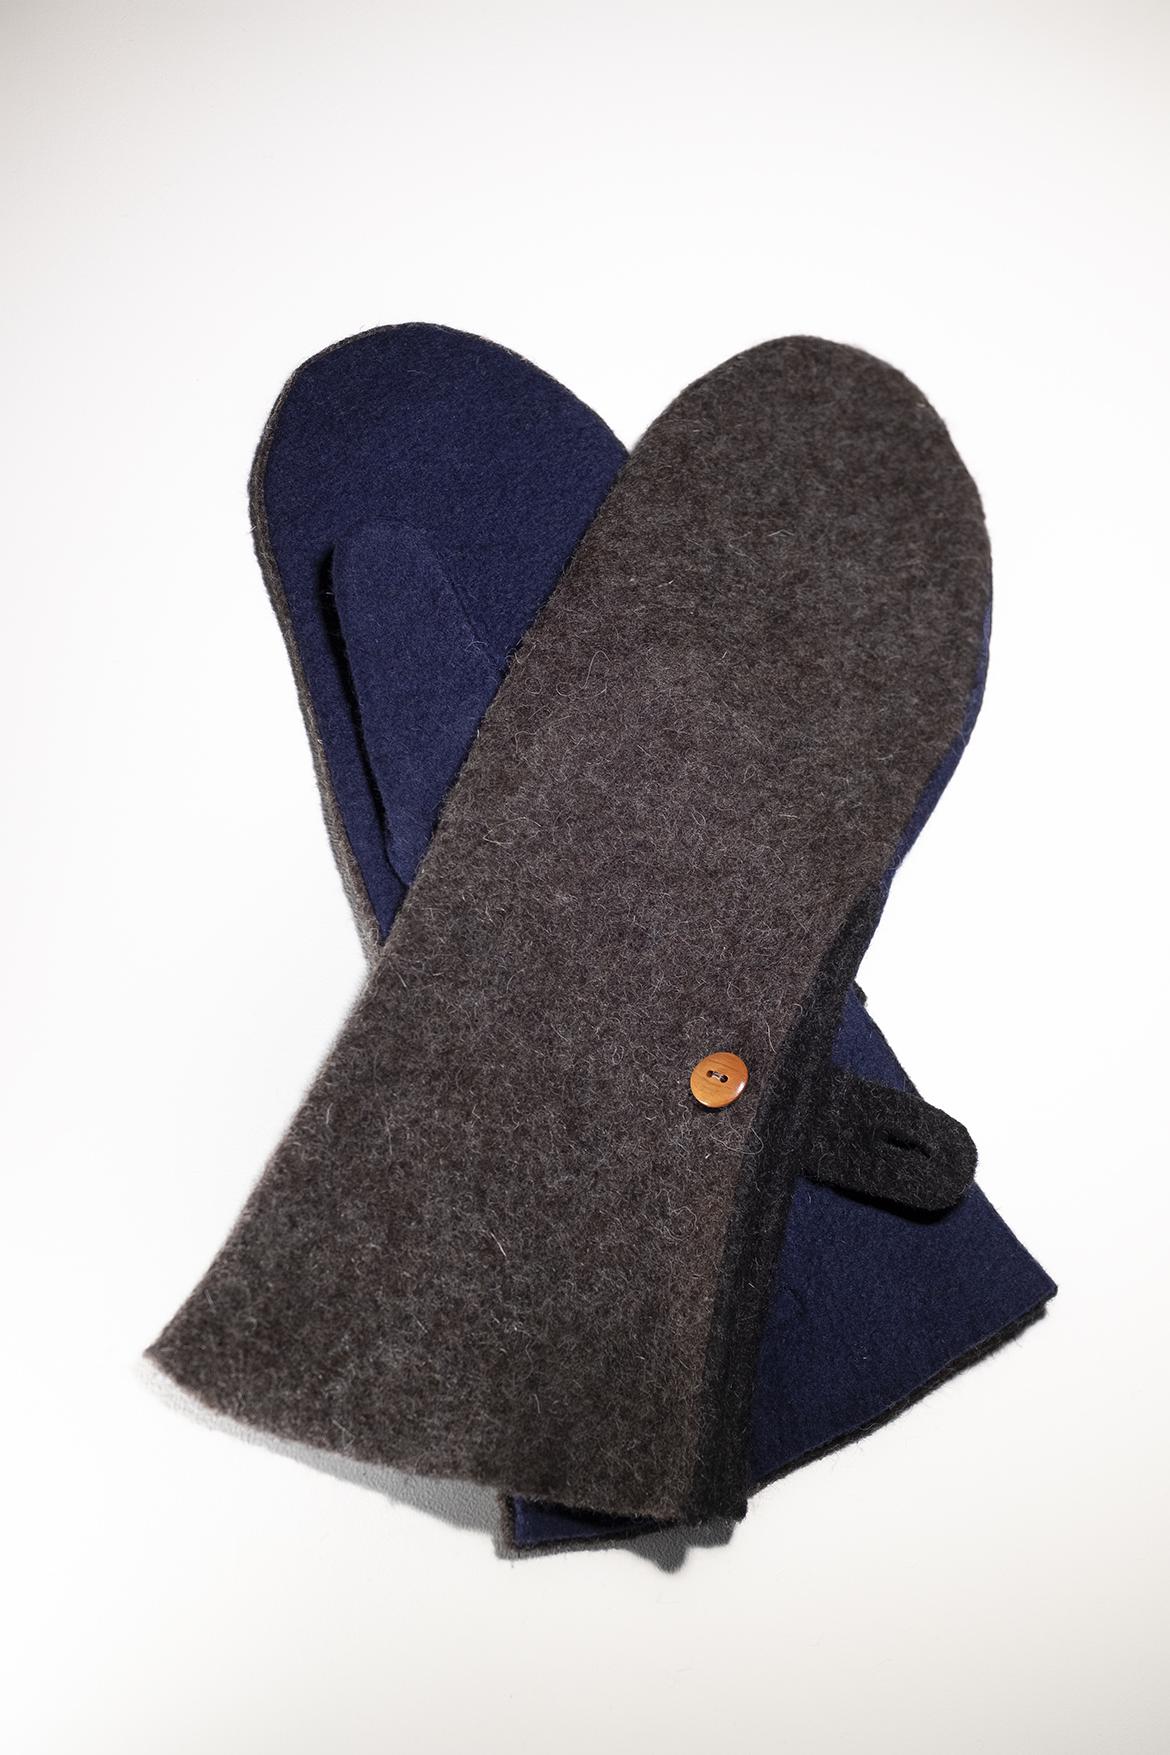 long mittens dark brown navy blue